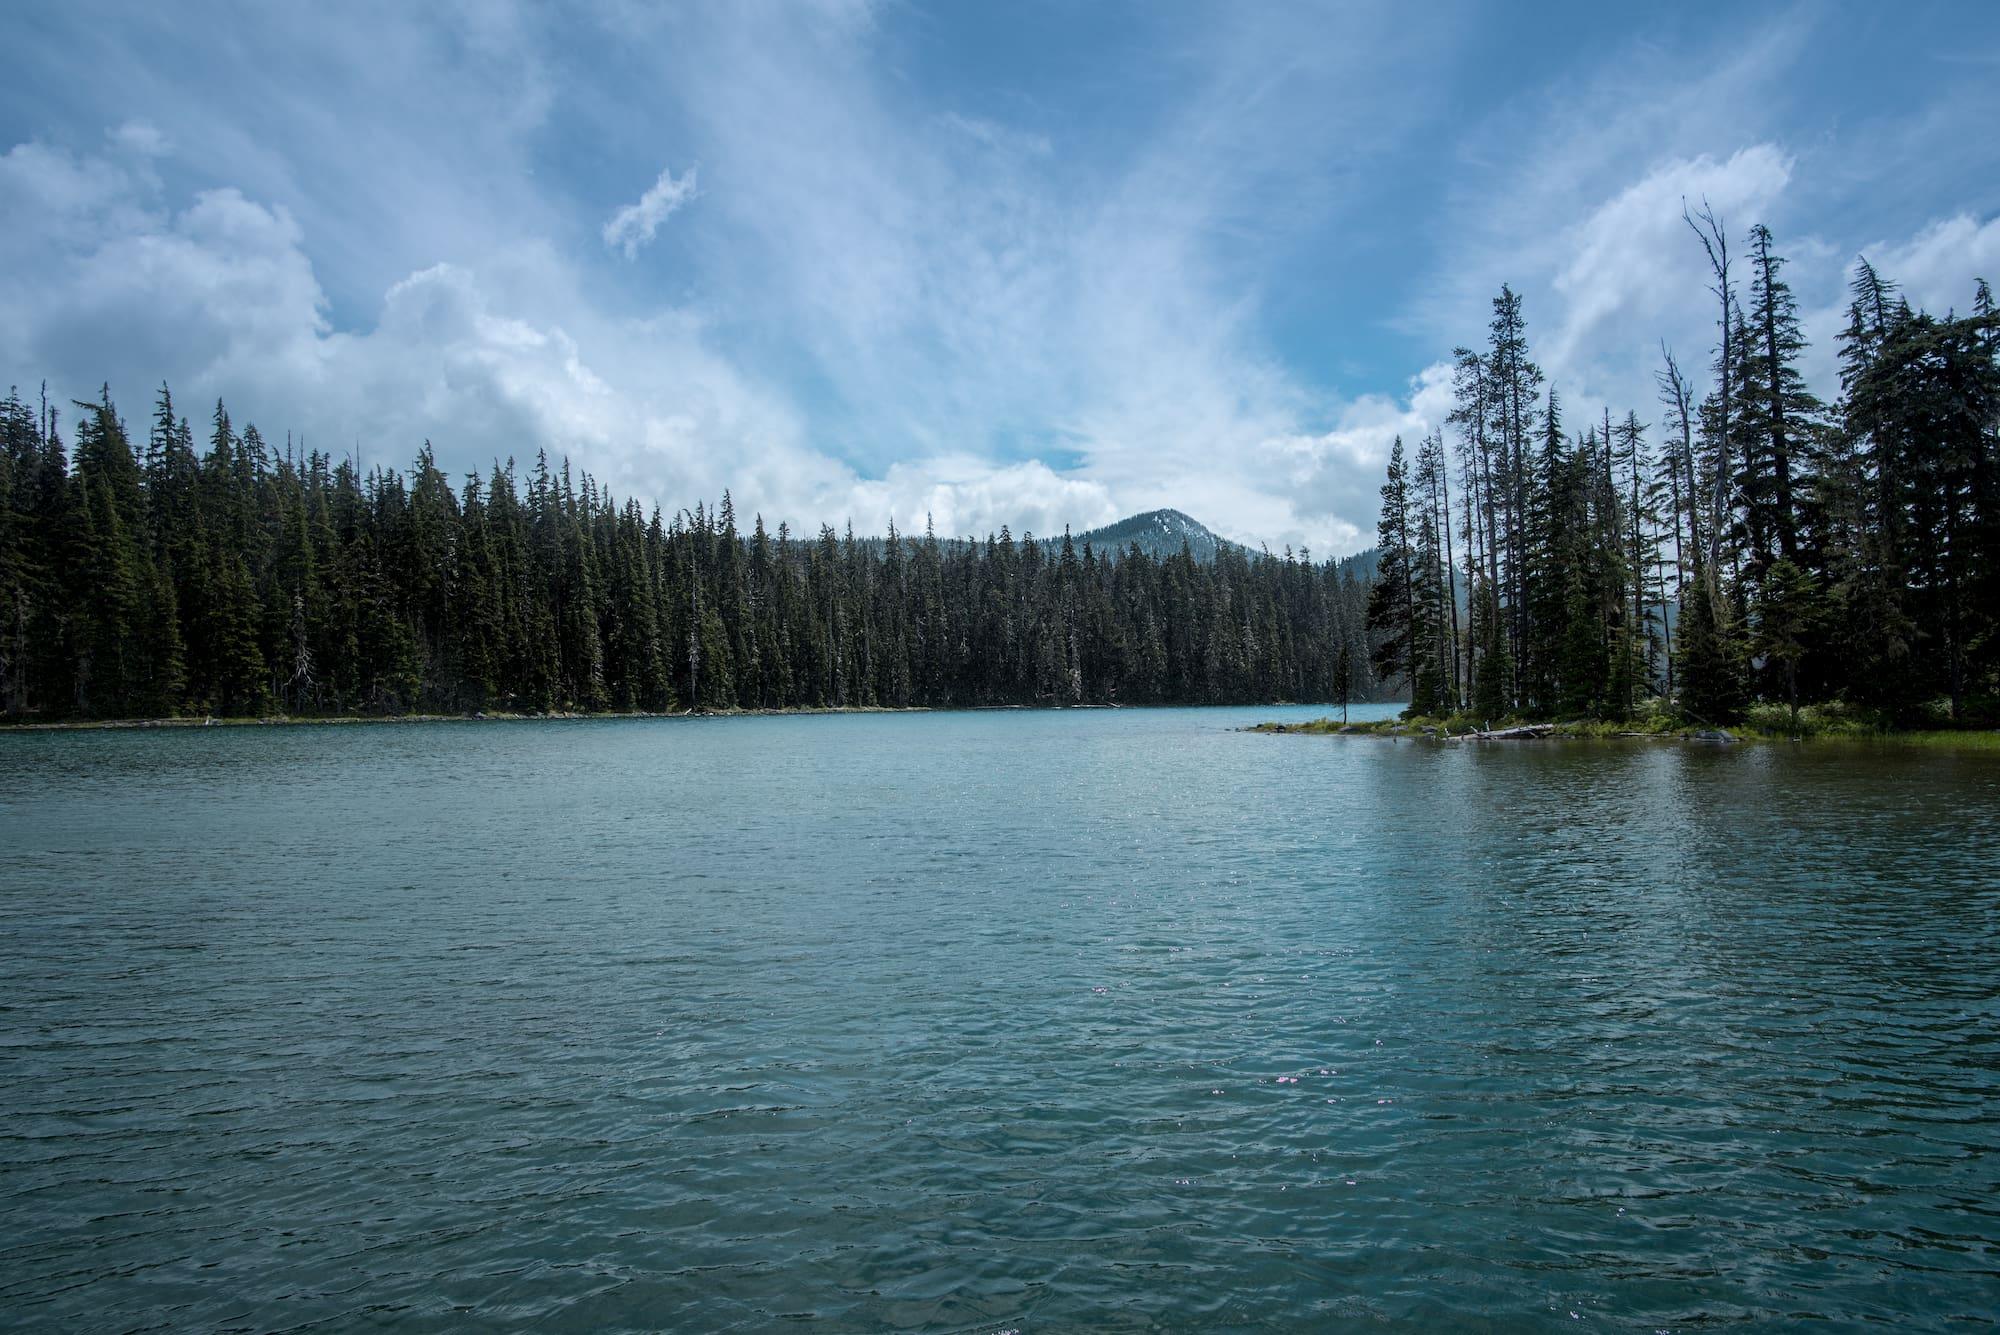 Waldo Lake, a campground near Eugene Oregon.